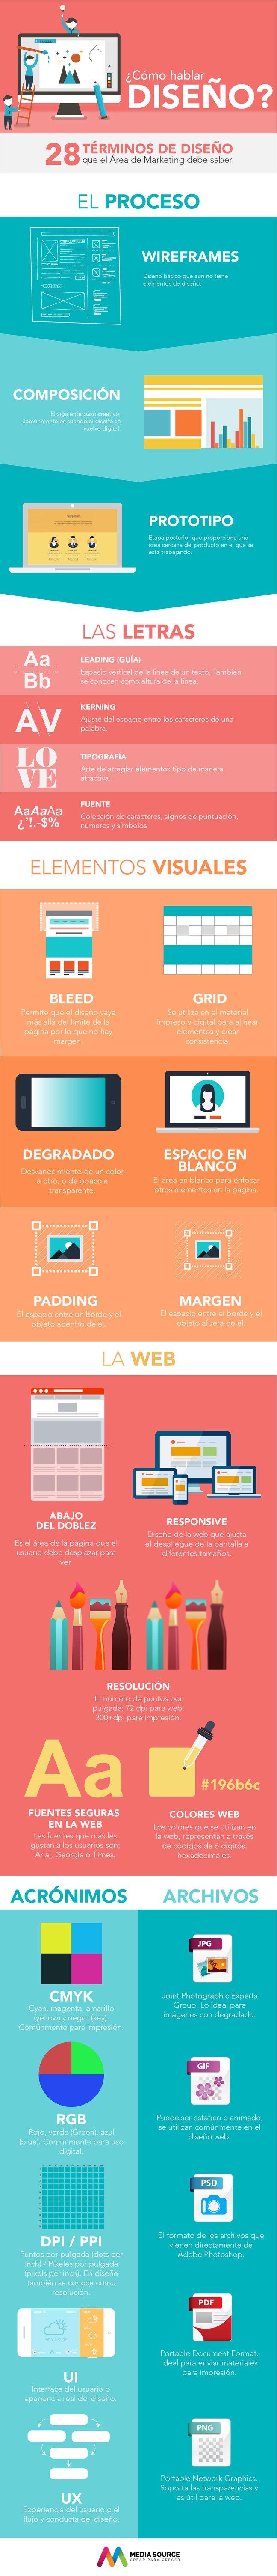 infografía-diseno-grafico-marketing